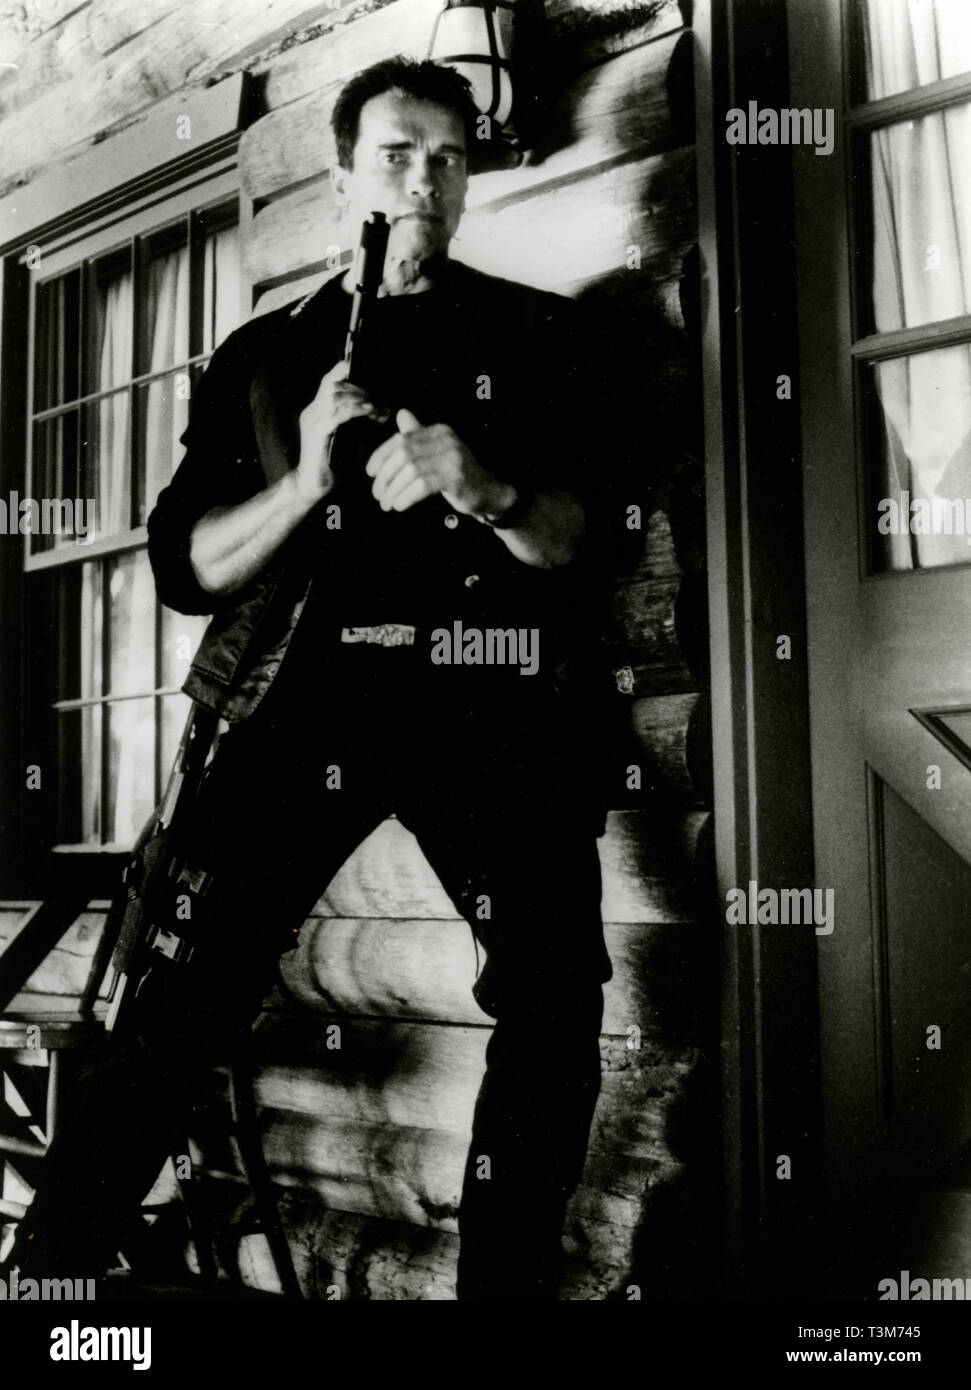 Arnold Schwarzenegger In The Movie Eraser 1996 Stock Photo Alamy